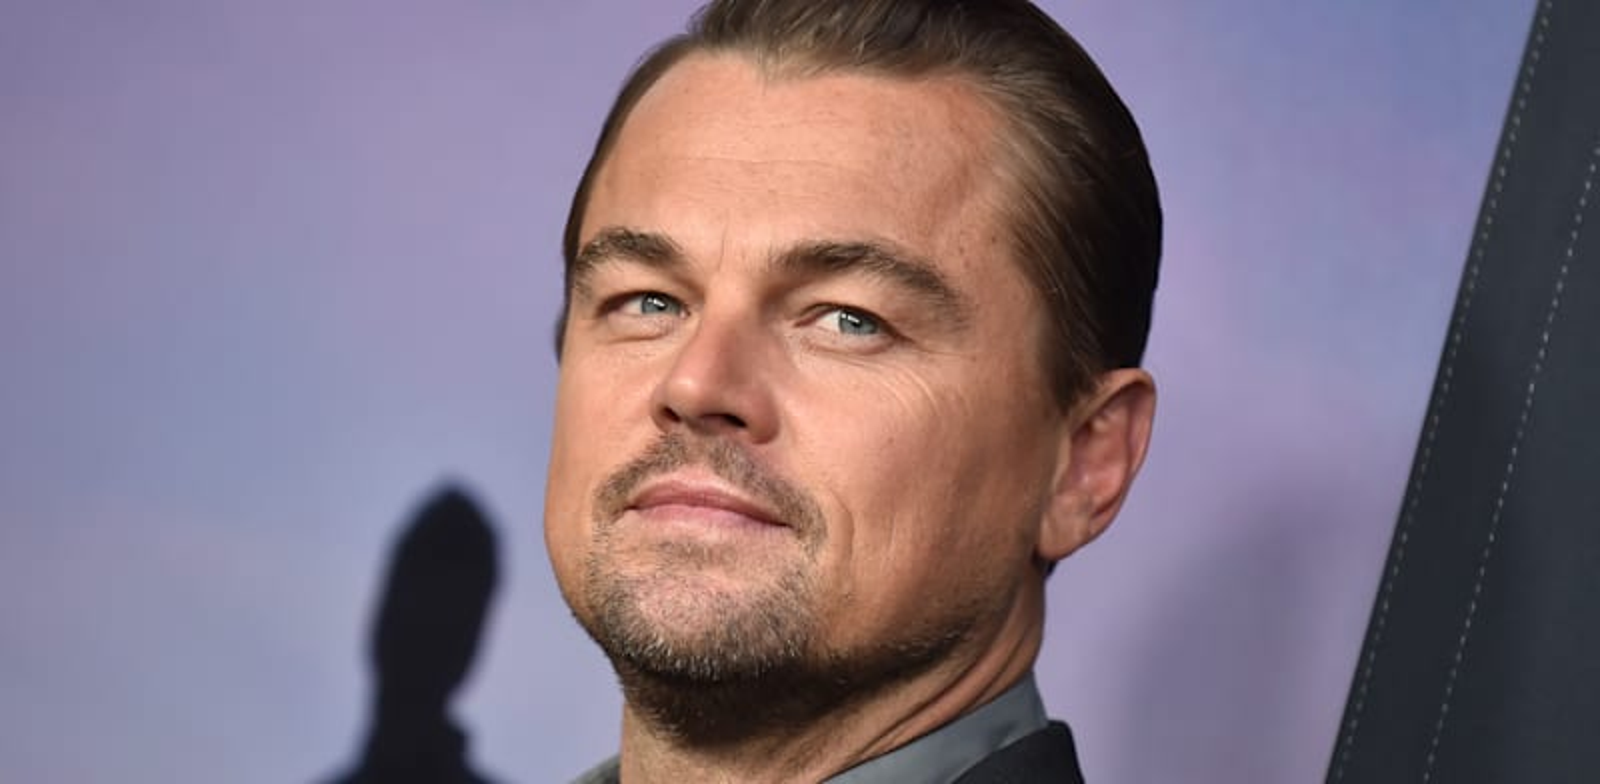 Leonardo DiCaprio Photo: Shutterstock